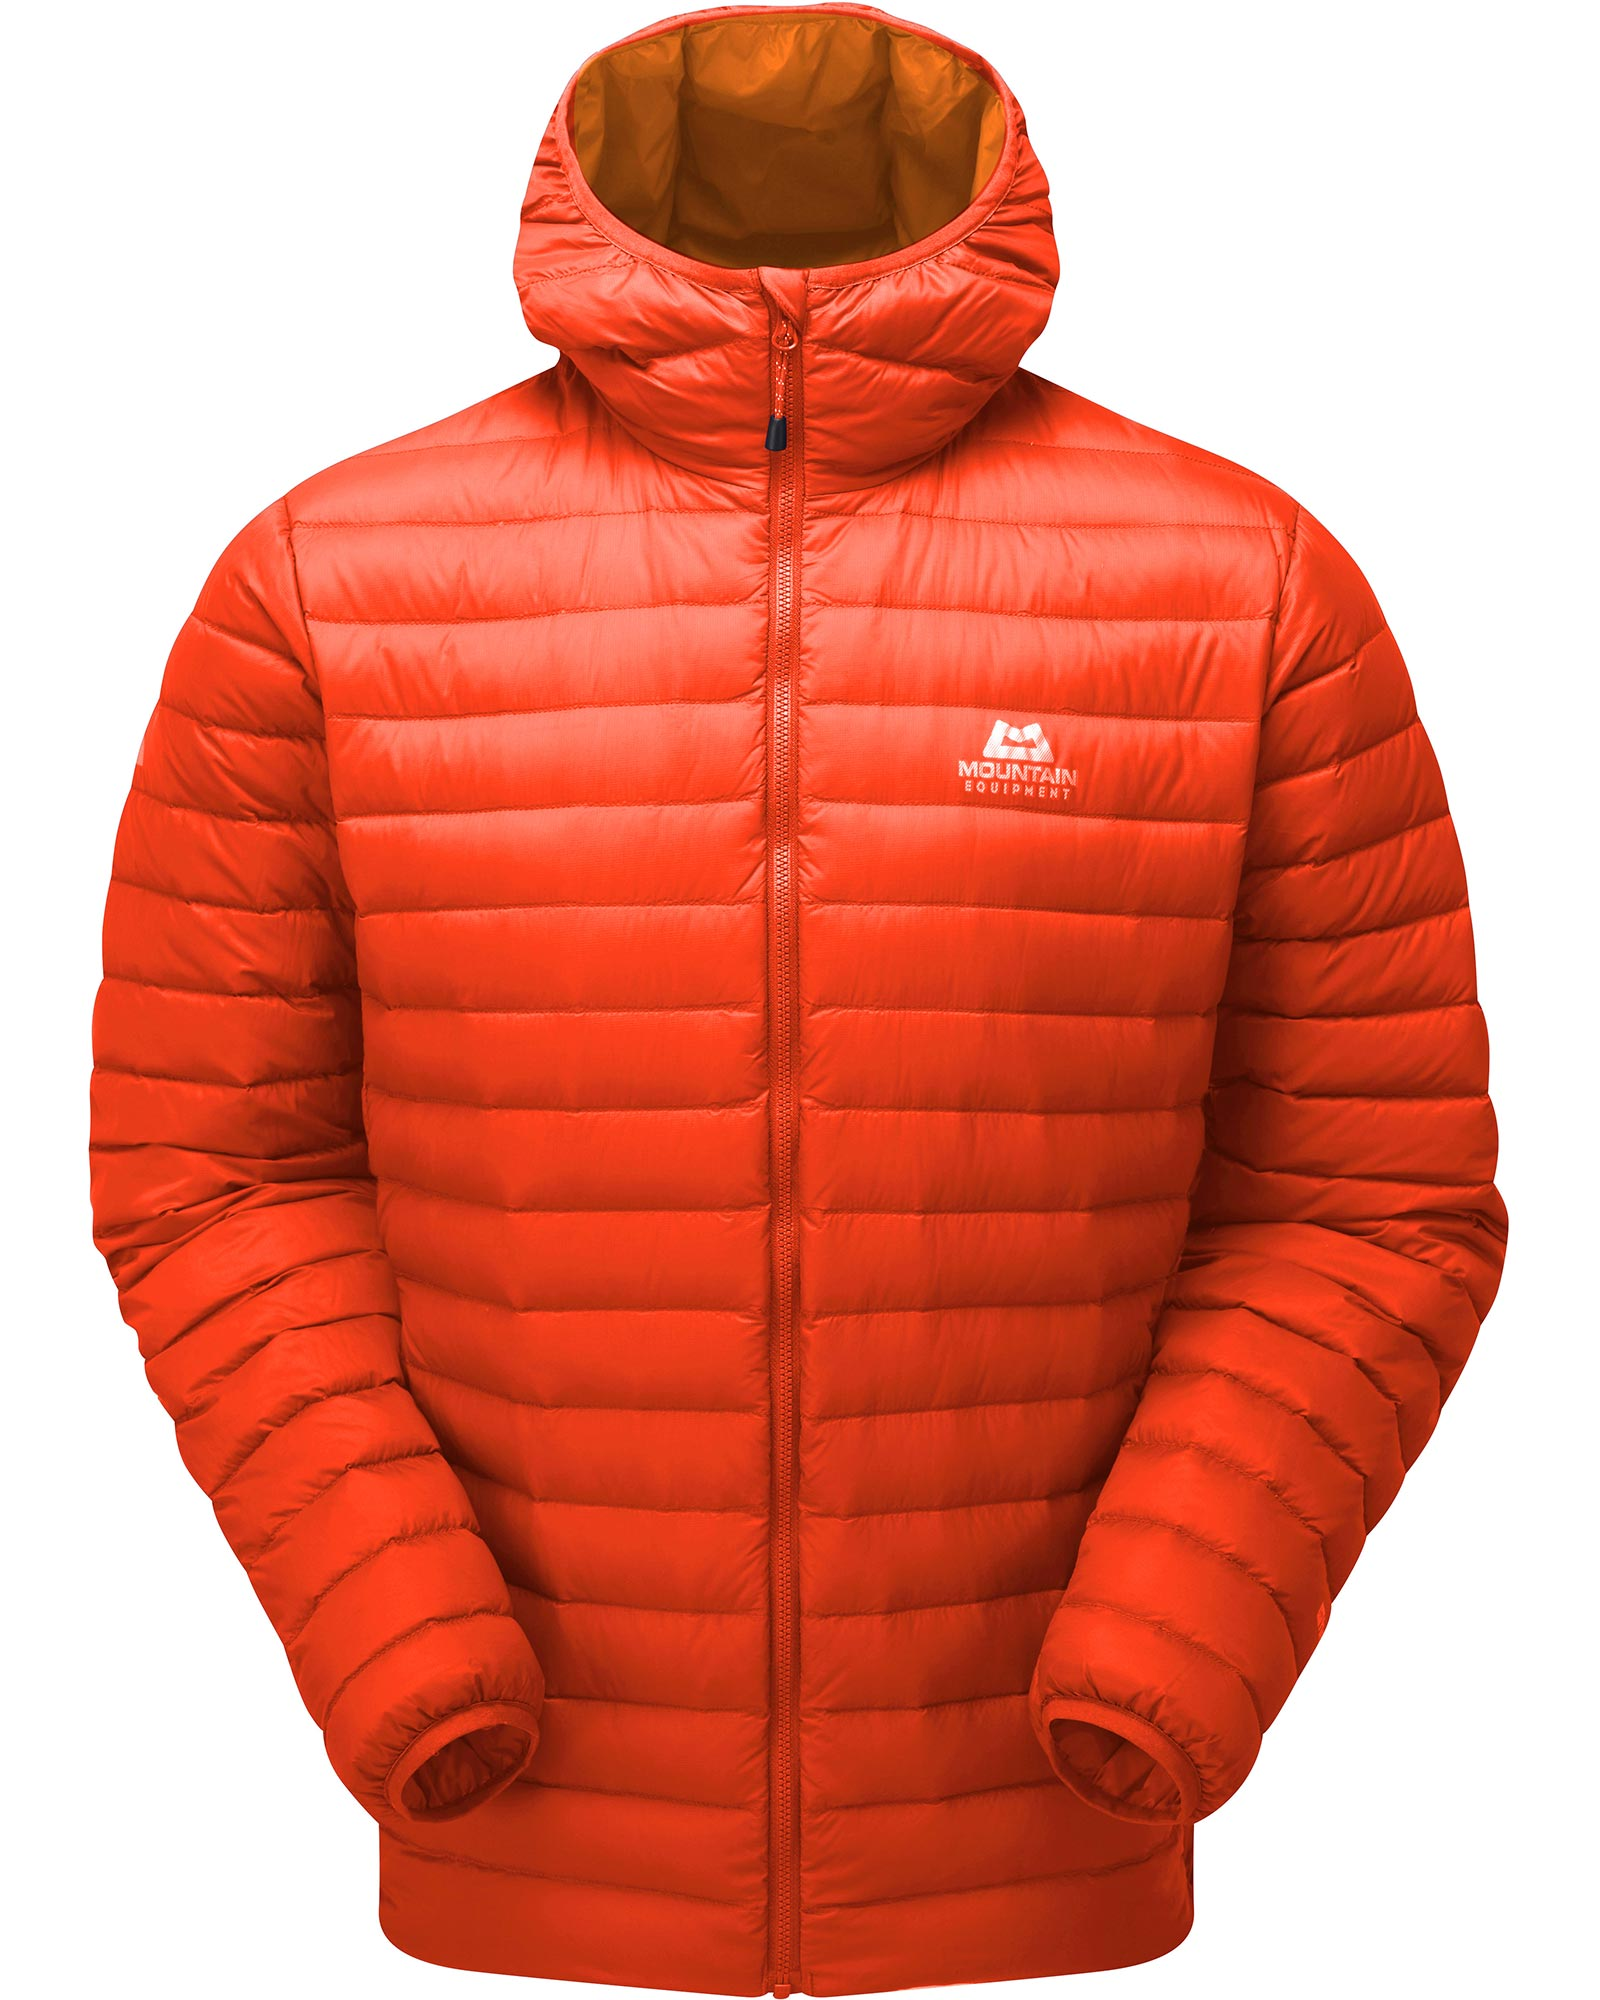 Mountain Equipment Arete Men's Hooded Jacket 0